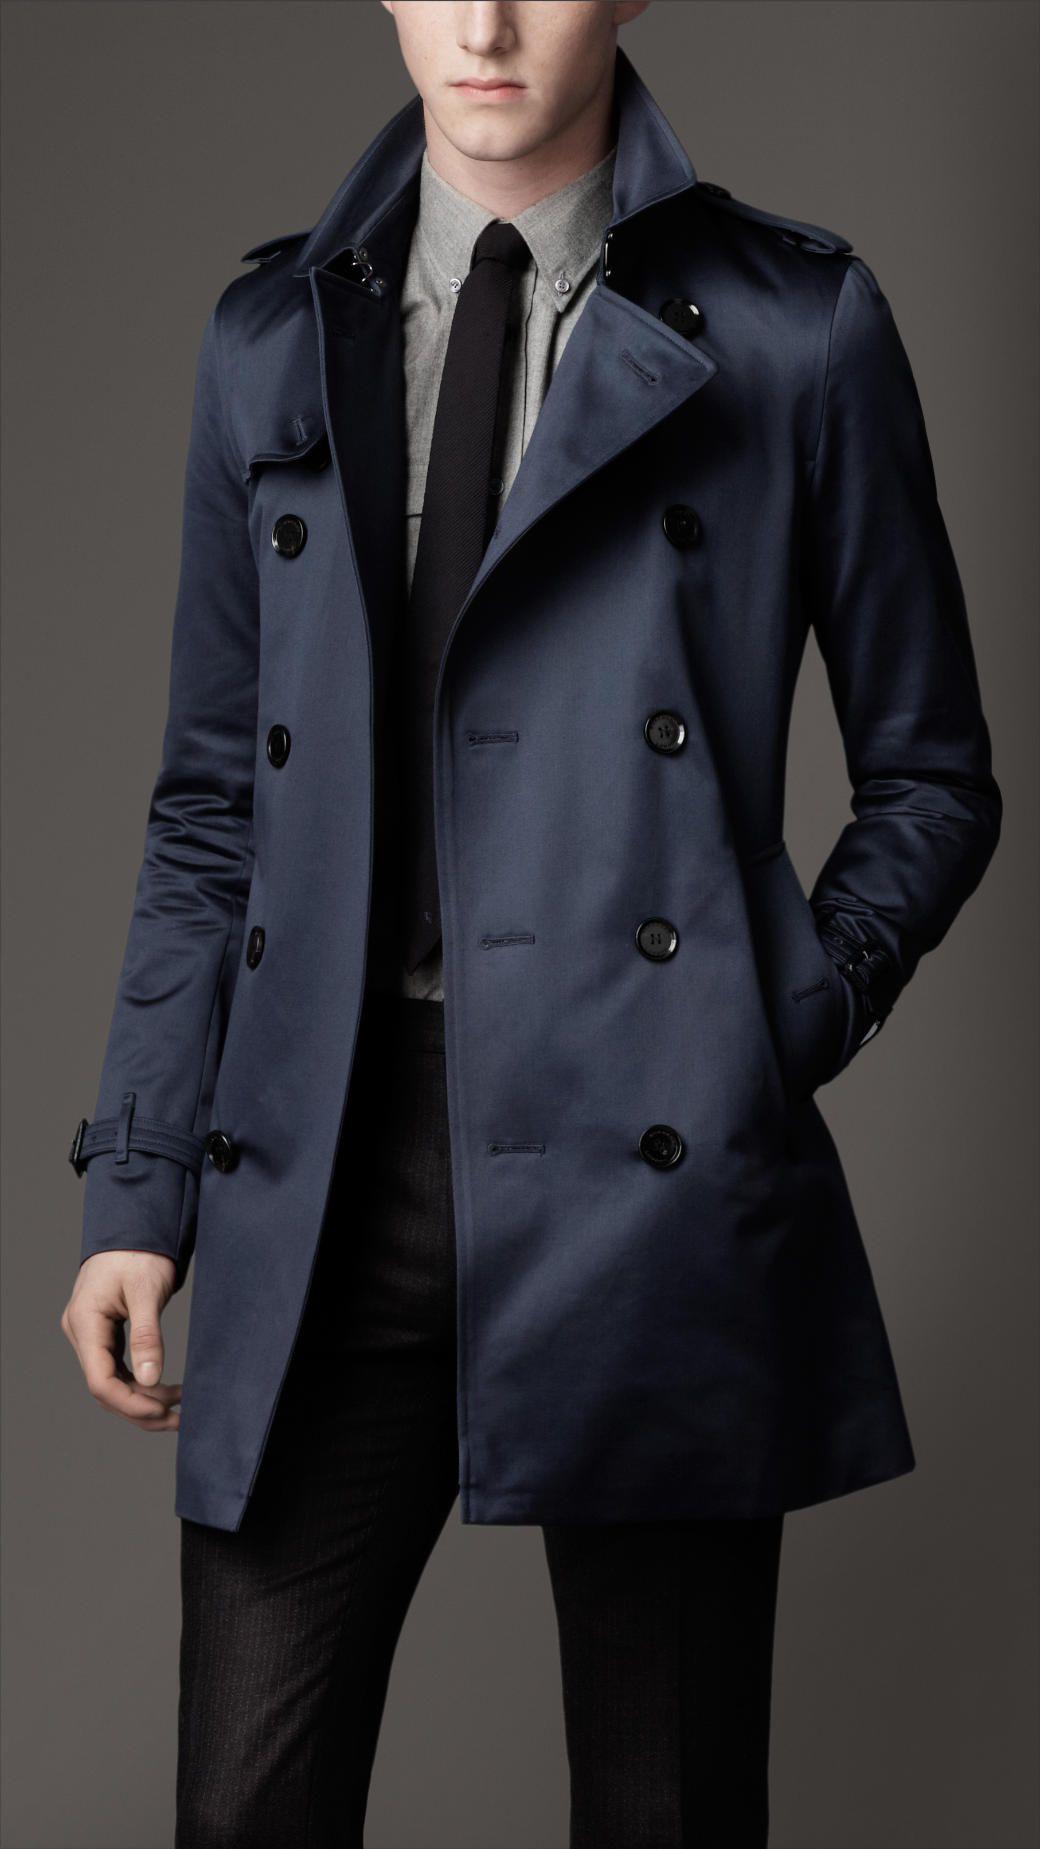 New Design European Style Mens Trench Coat - Buy Mens Trench Coat ...